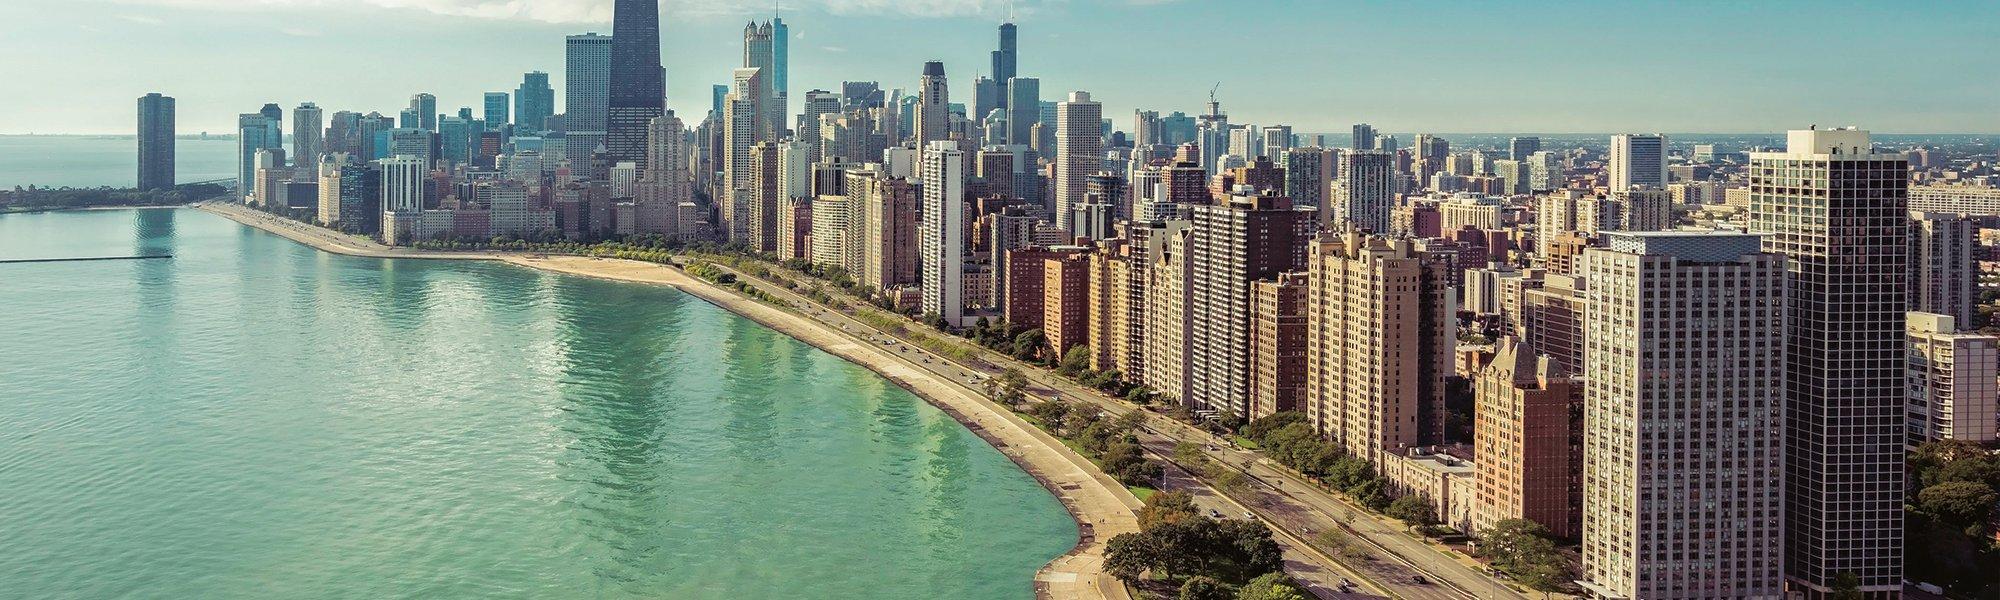 Chicago, Illinois.jpg